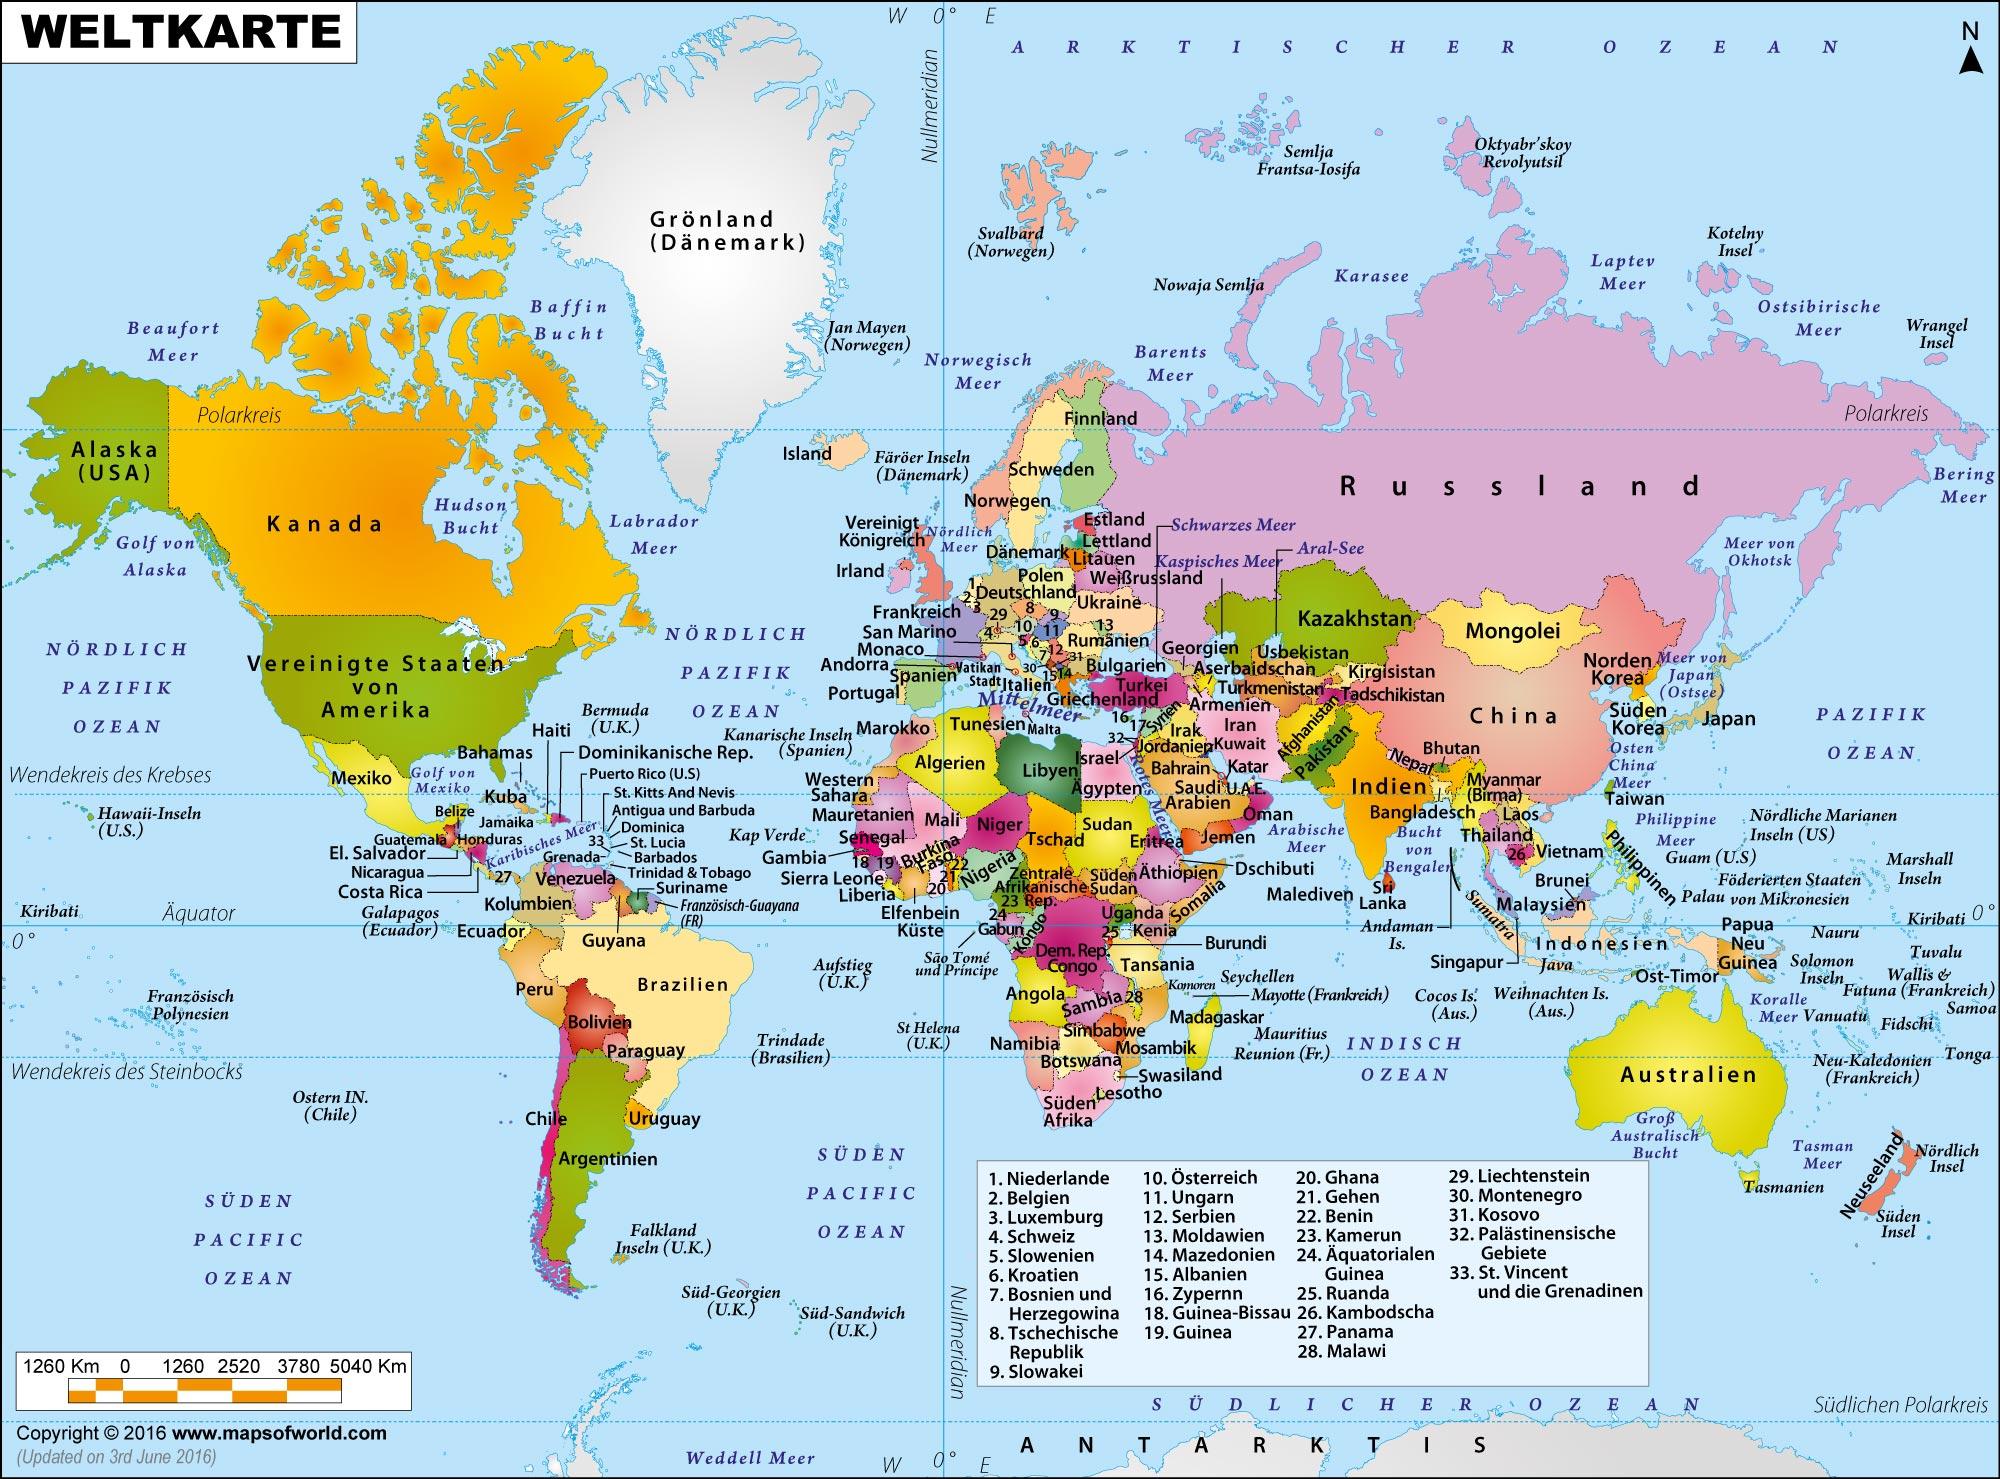 Weltkarte bild - Weltkarte mit fotos ...